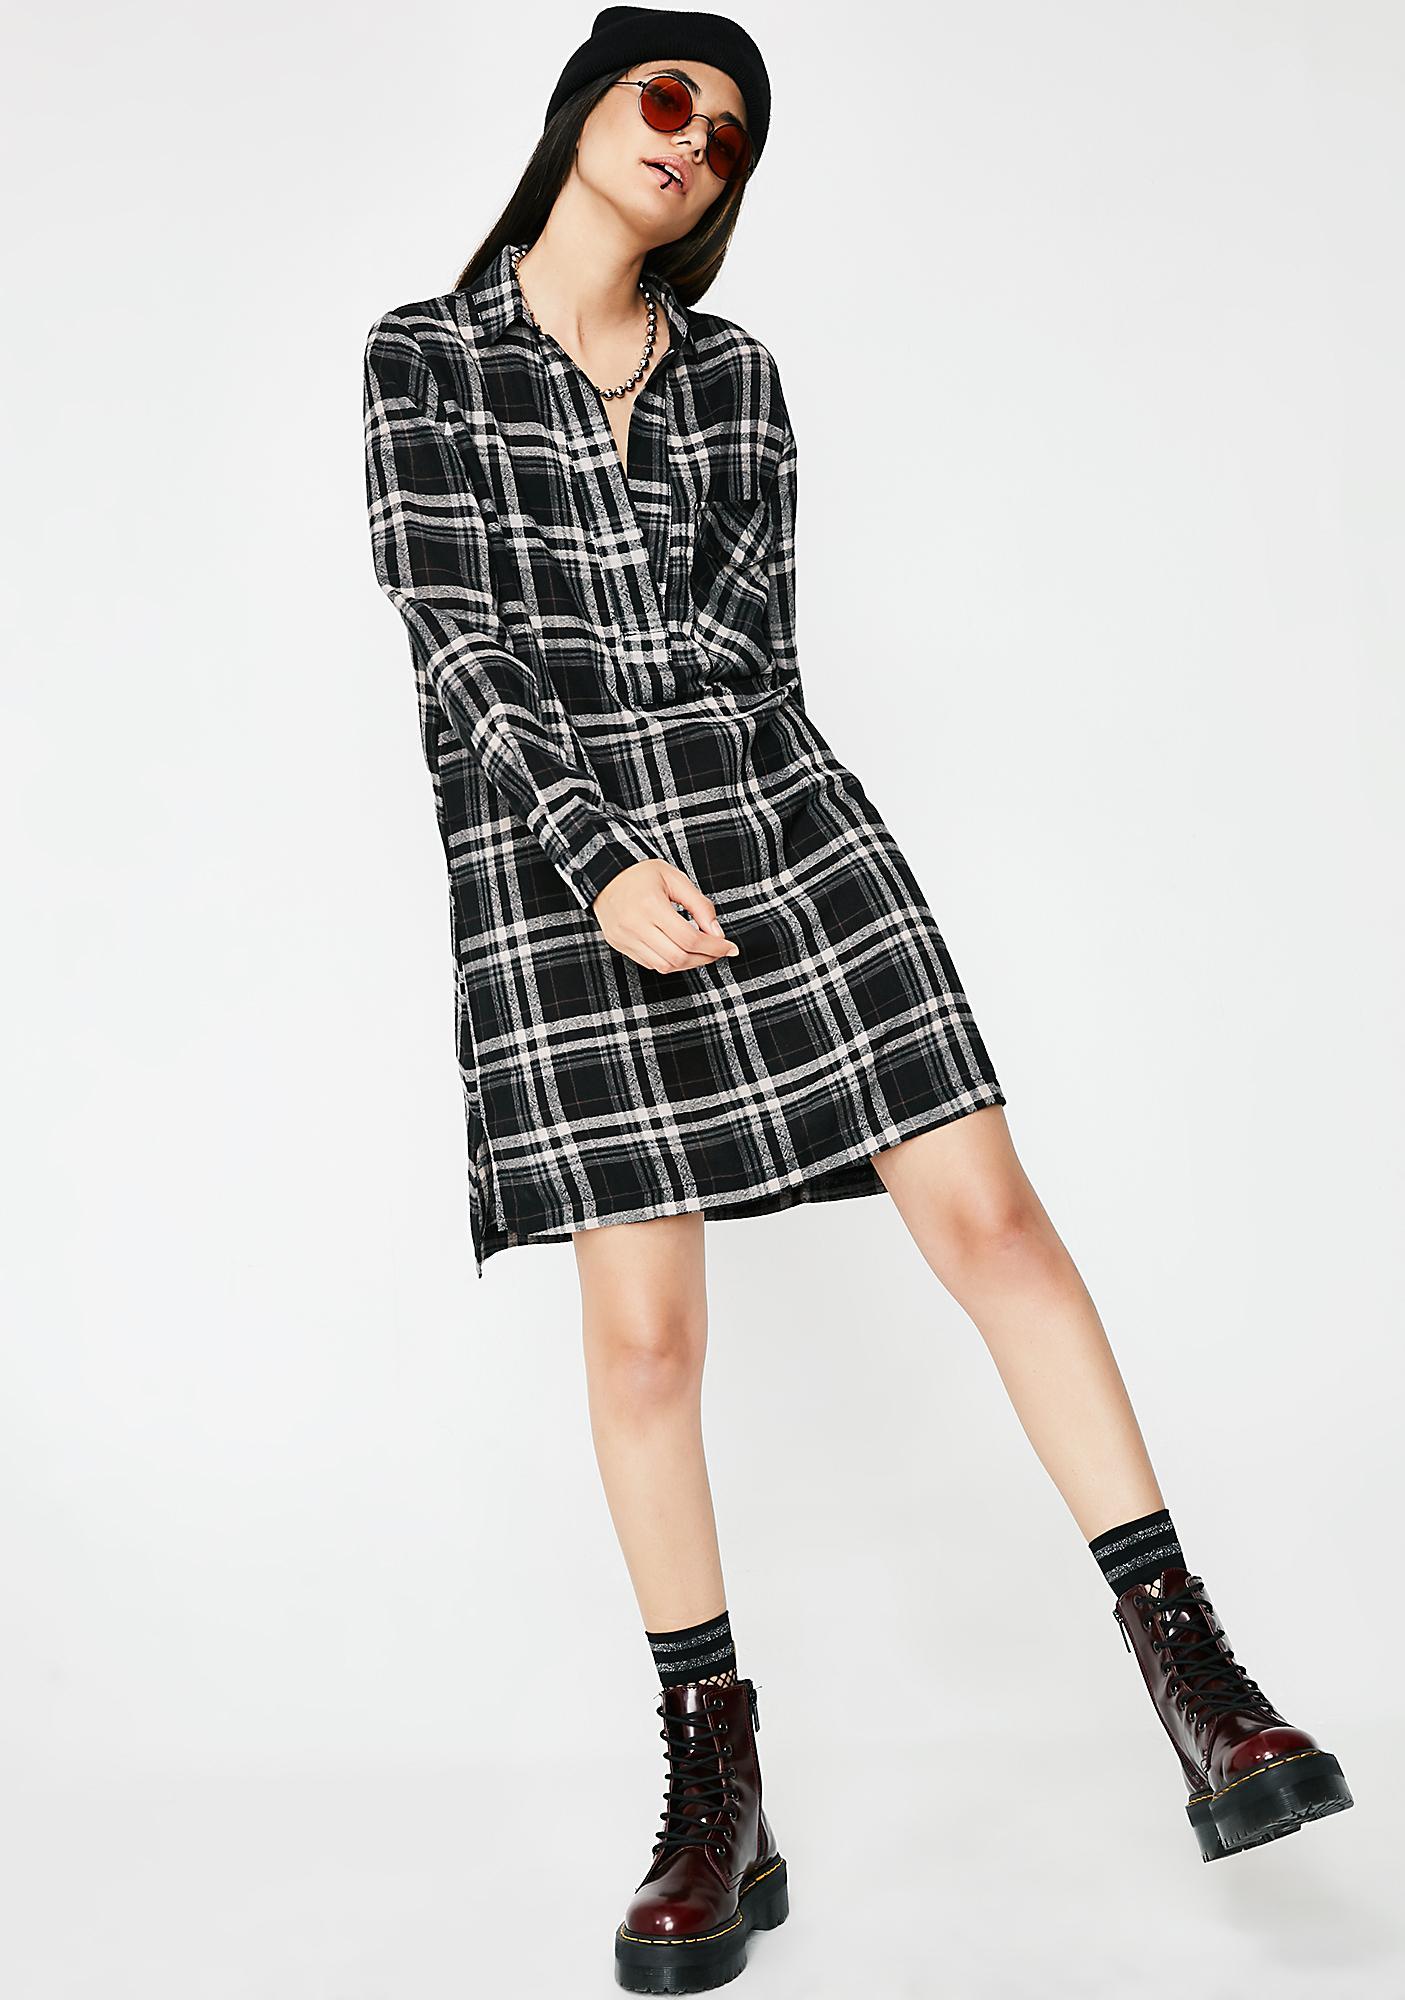 Lira Clothing Victory Plaid Dress